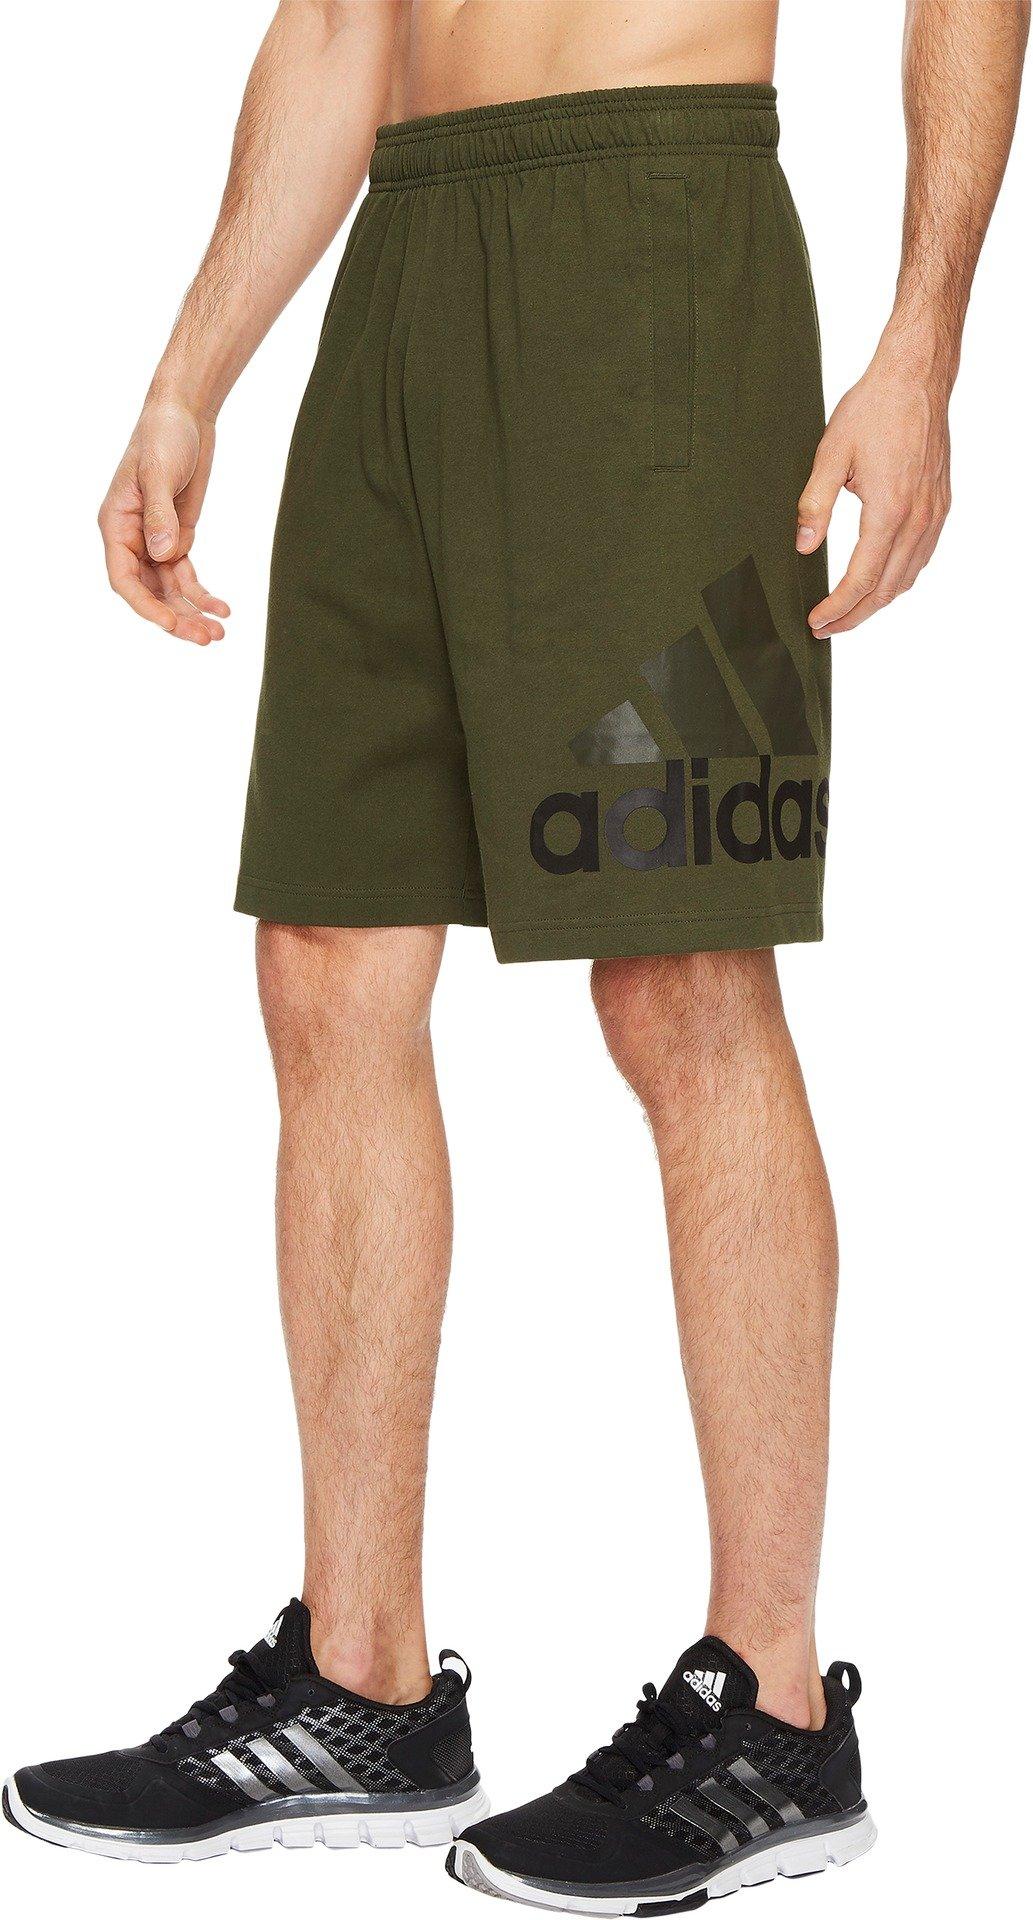 adidas Men's Athletics Jersey Shorts, Night